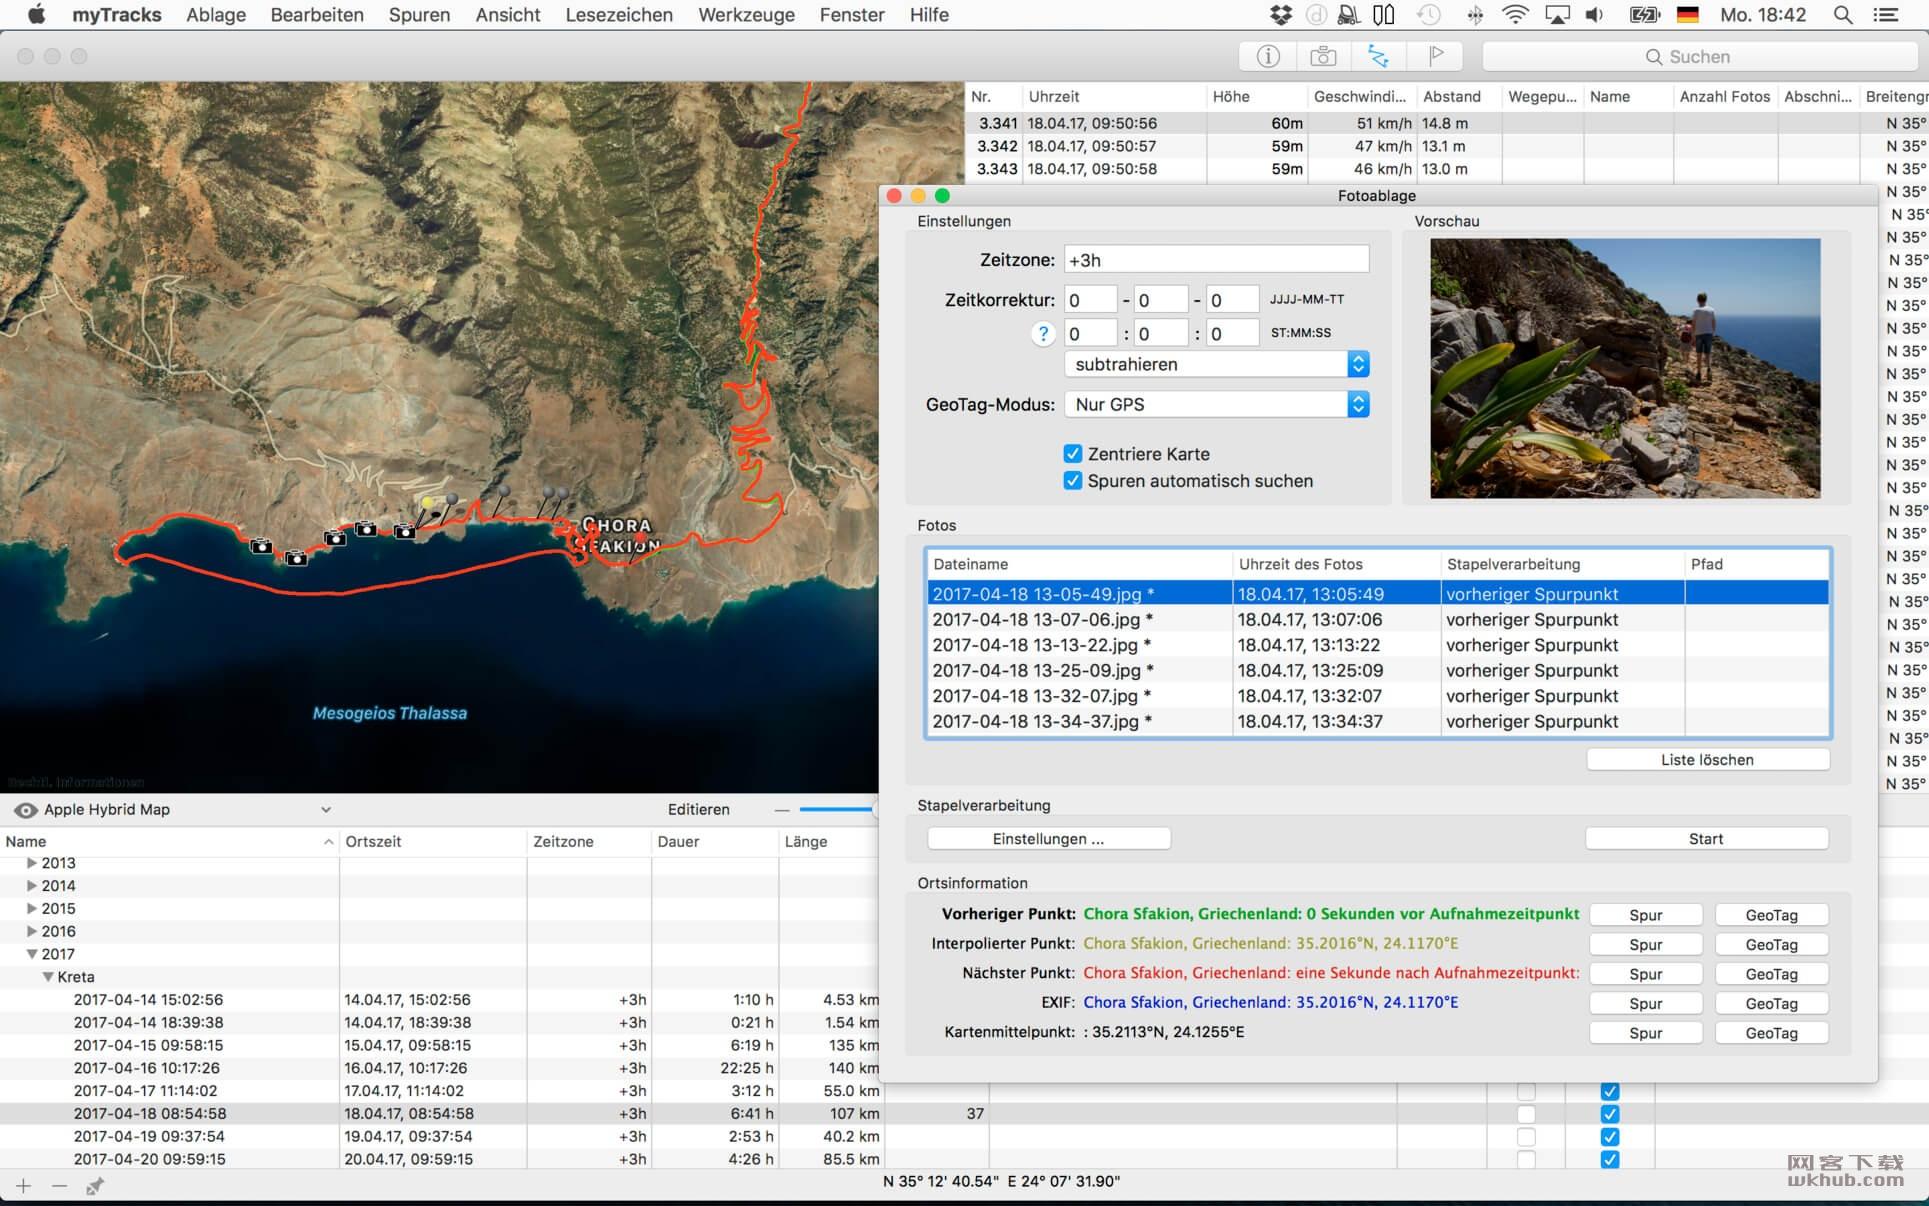 myTracks 3.4.1 GPS轨迹记录器